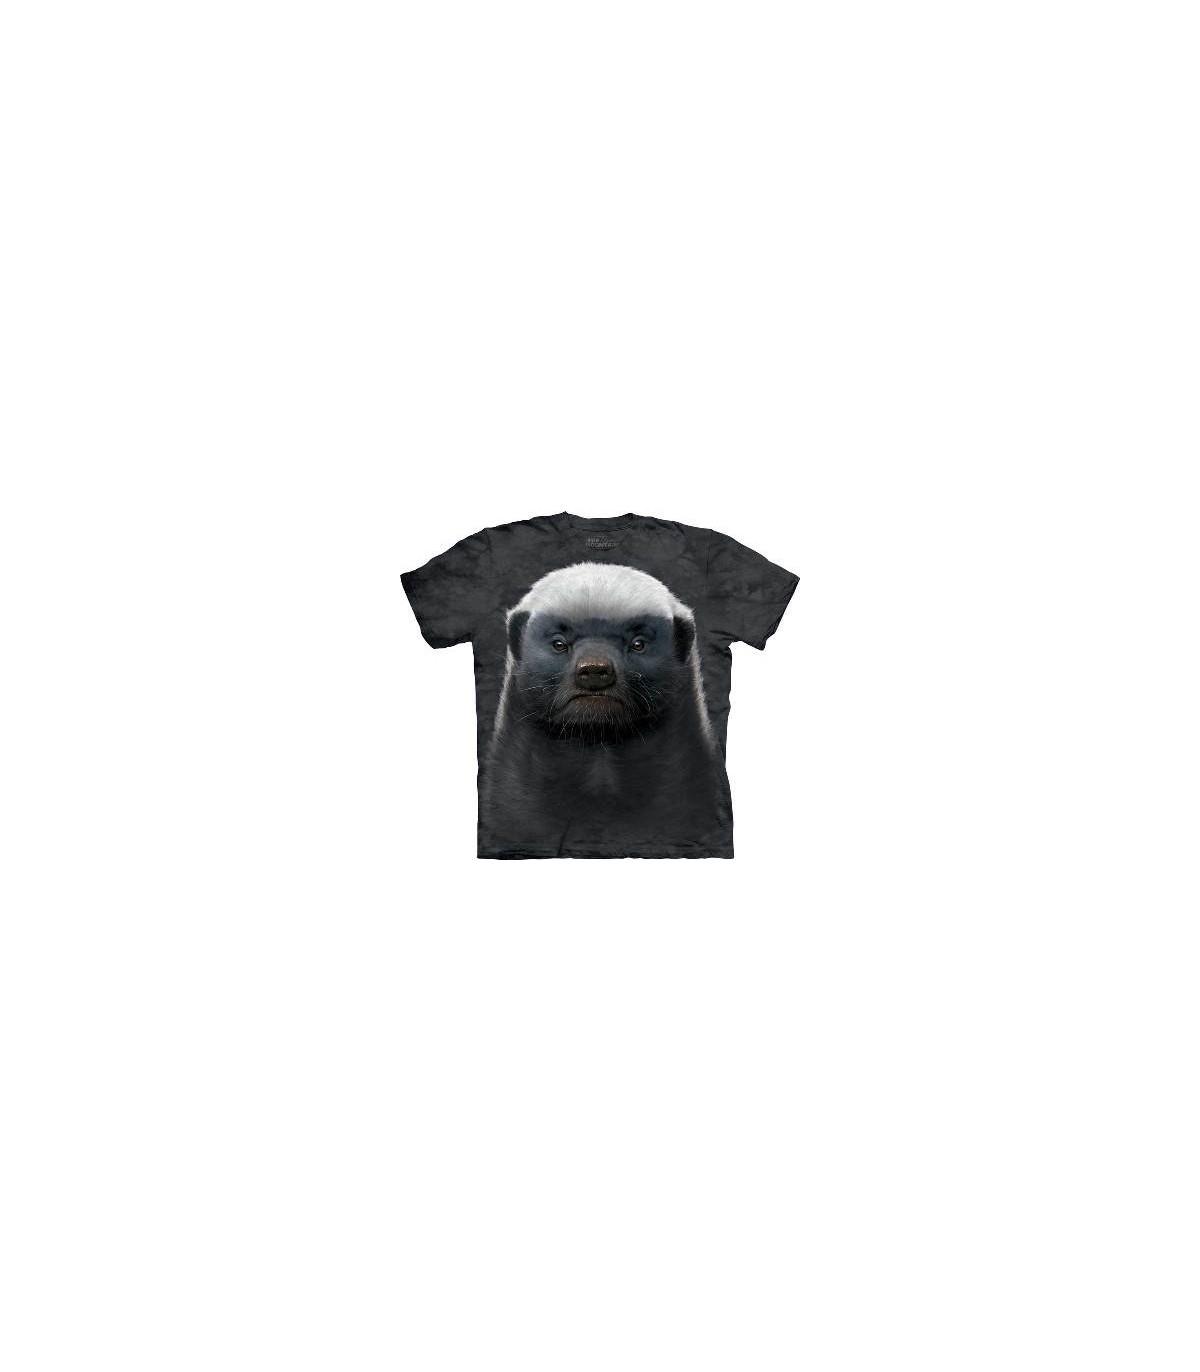 f479132e honey badger animals t shirt by the mountain jpg